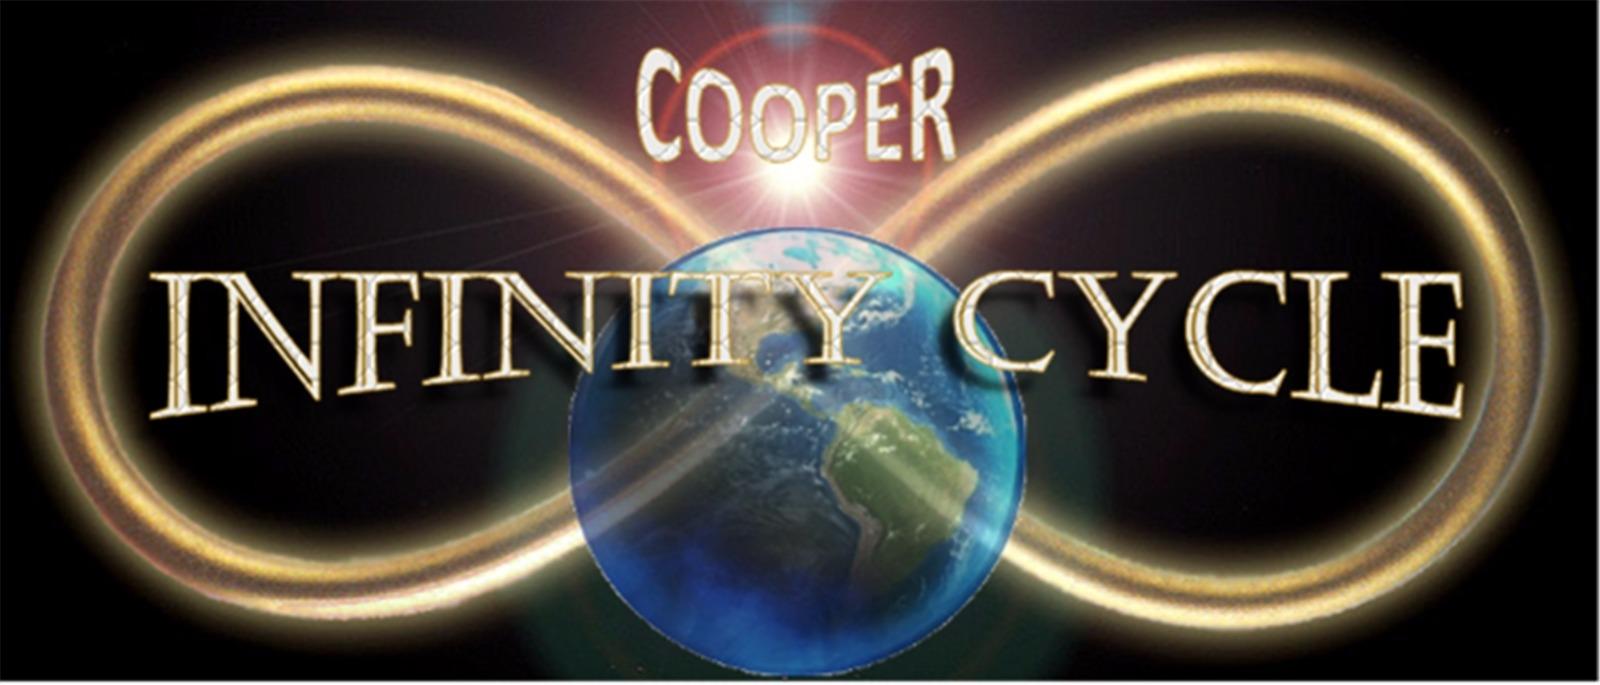 Cooper infinity cycle